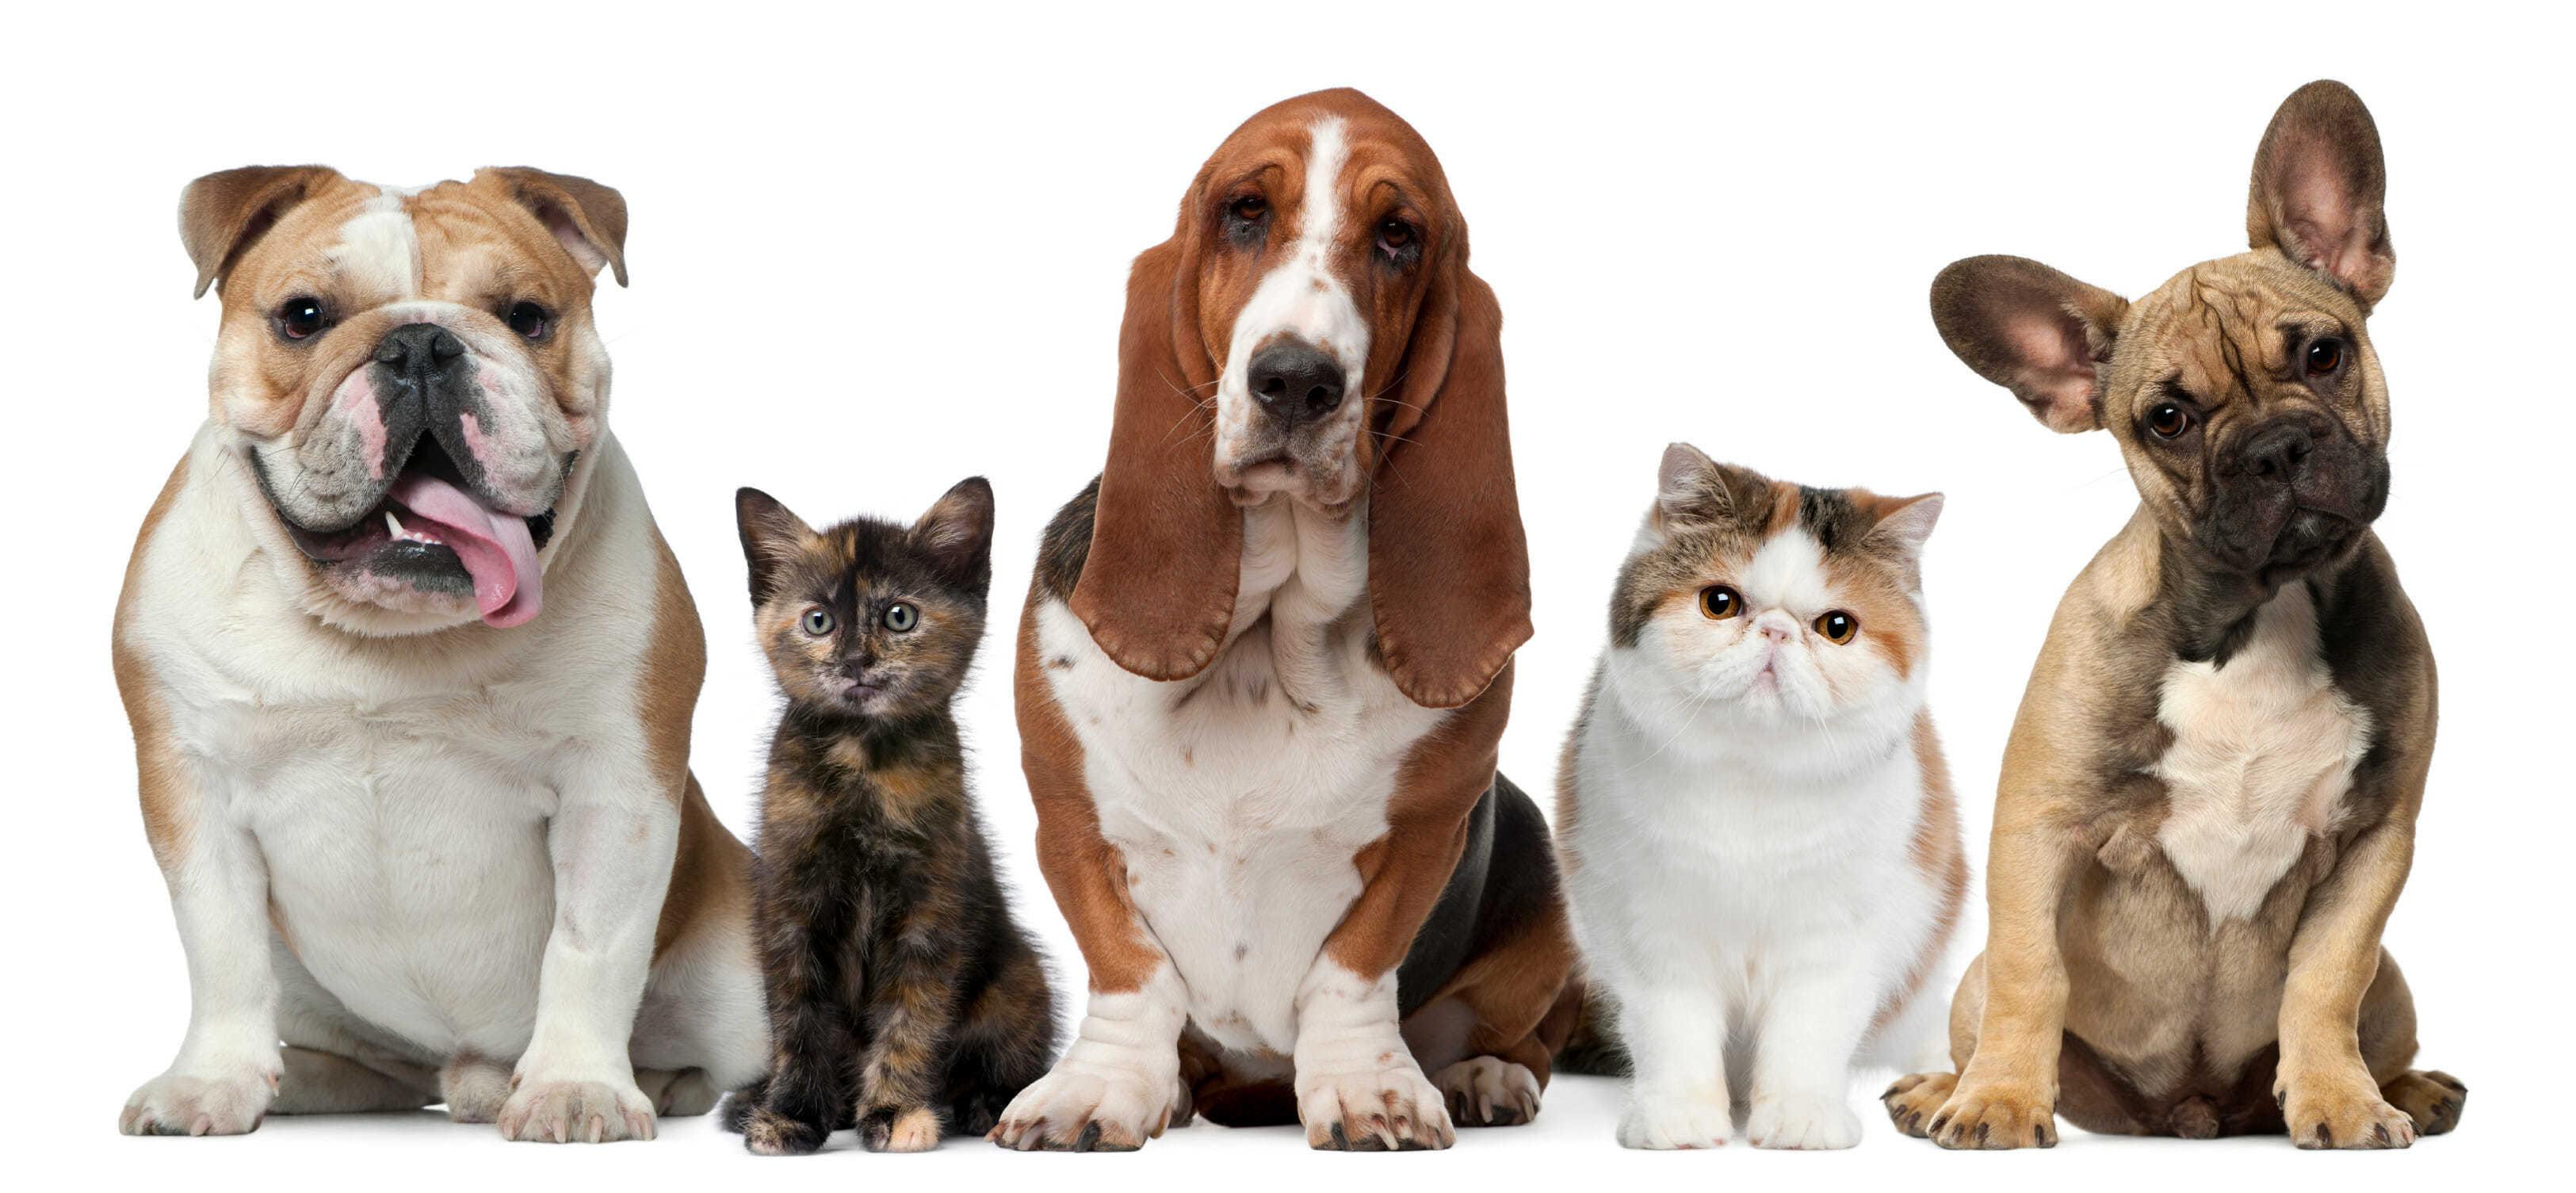 домашние животные - статистика Интерфакс